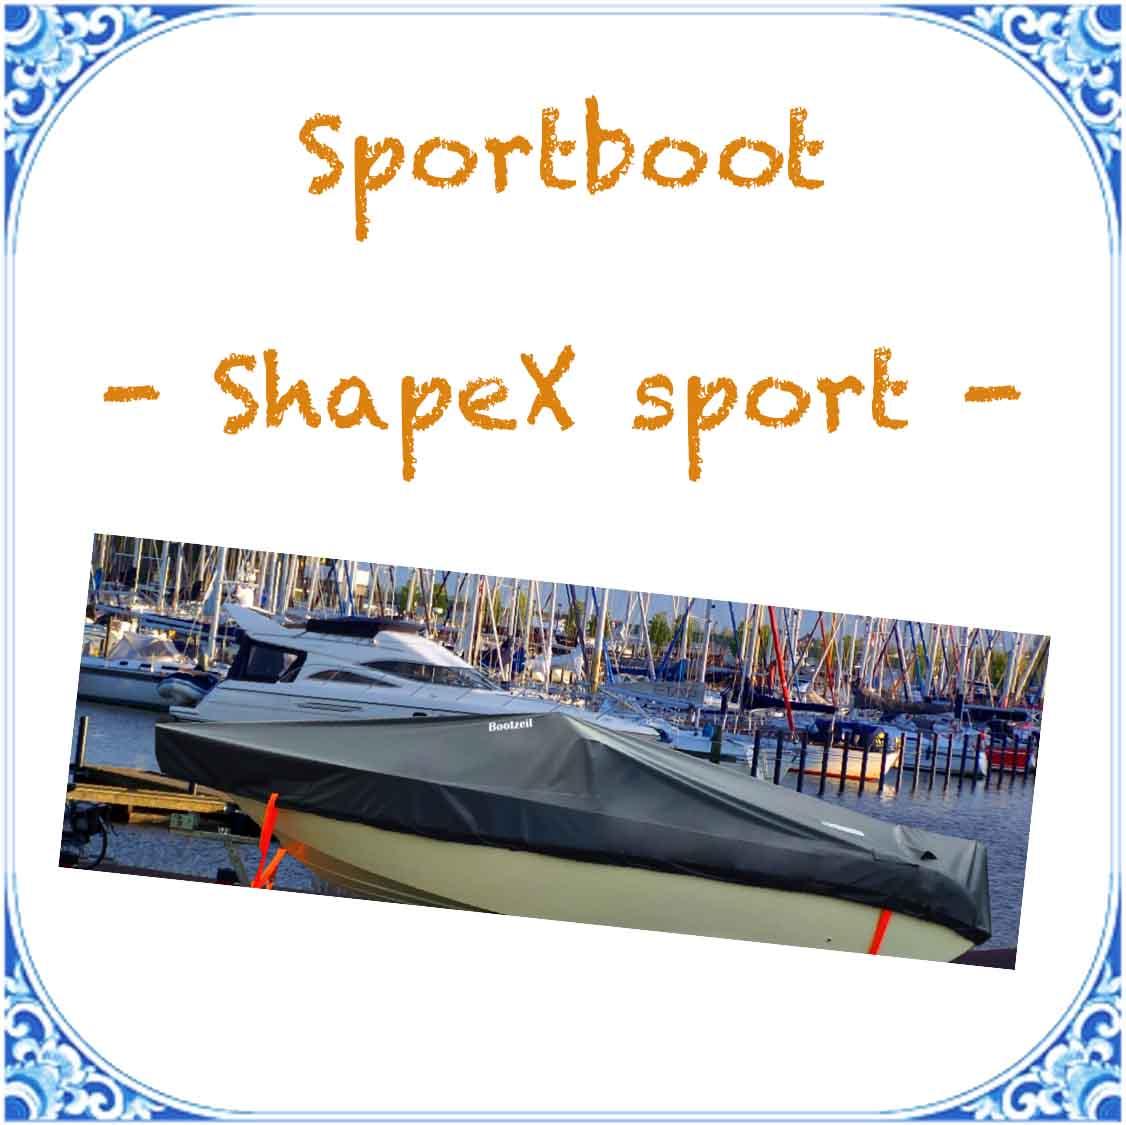 Abdeckplane Shape x Sport